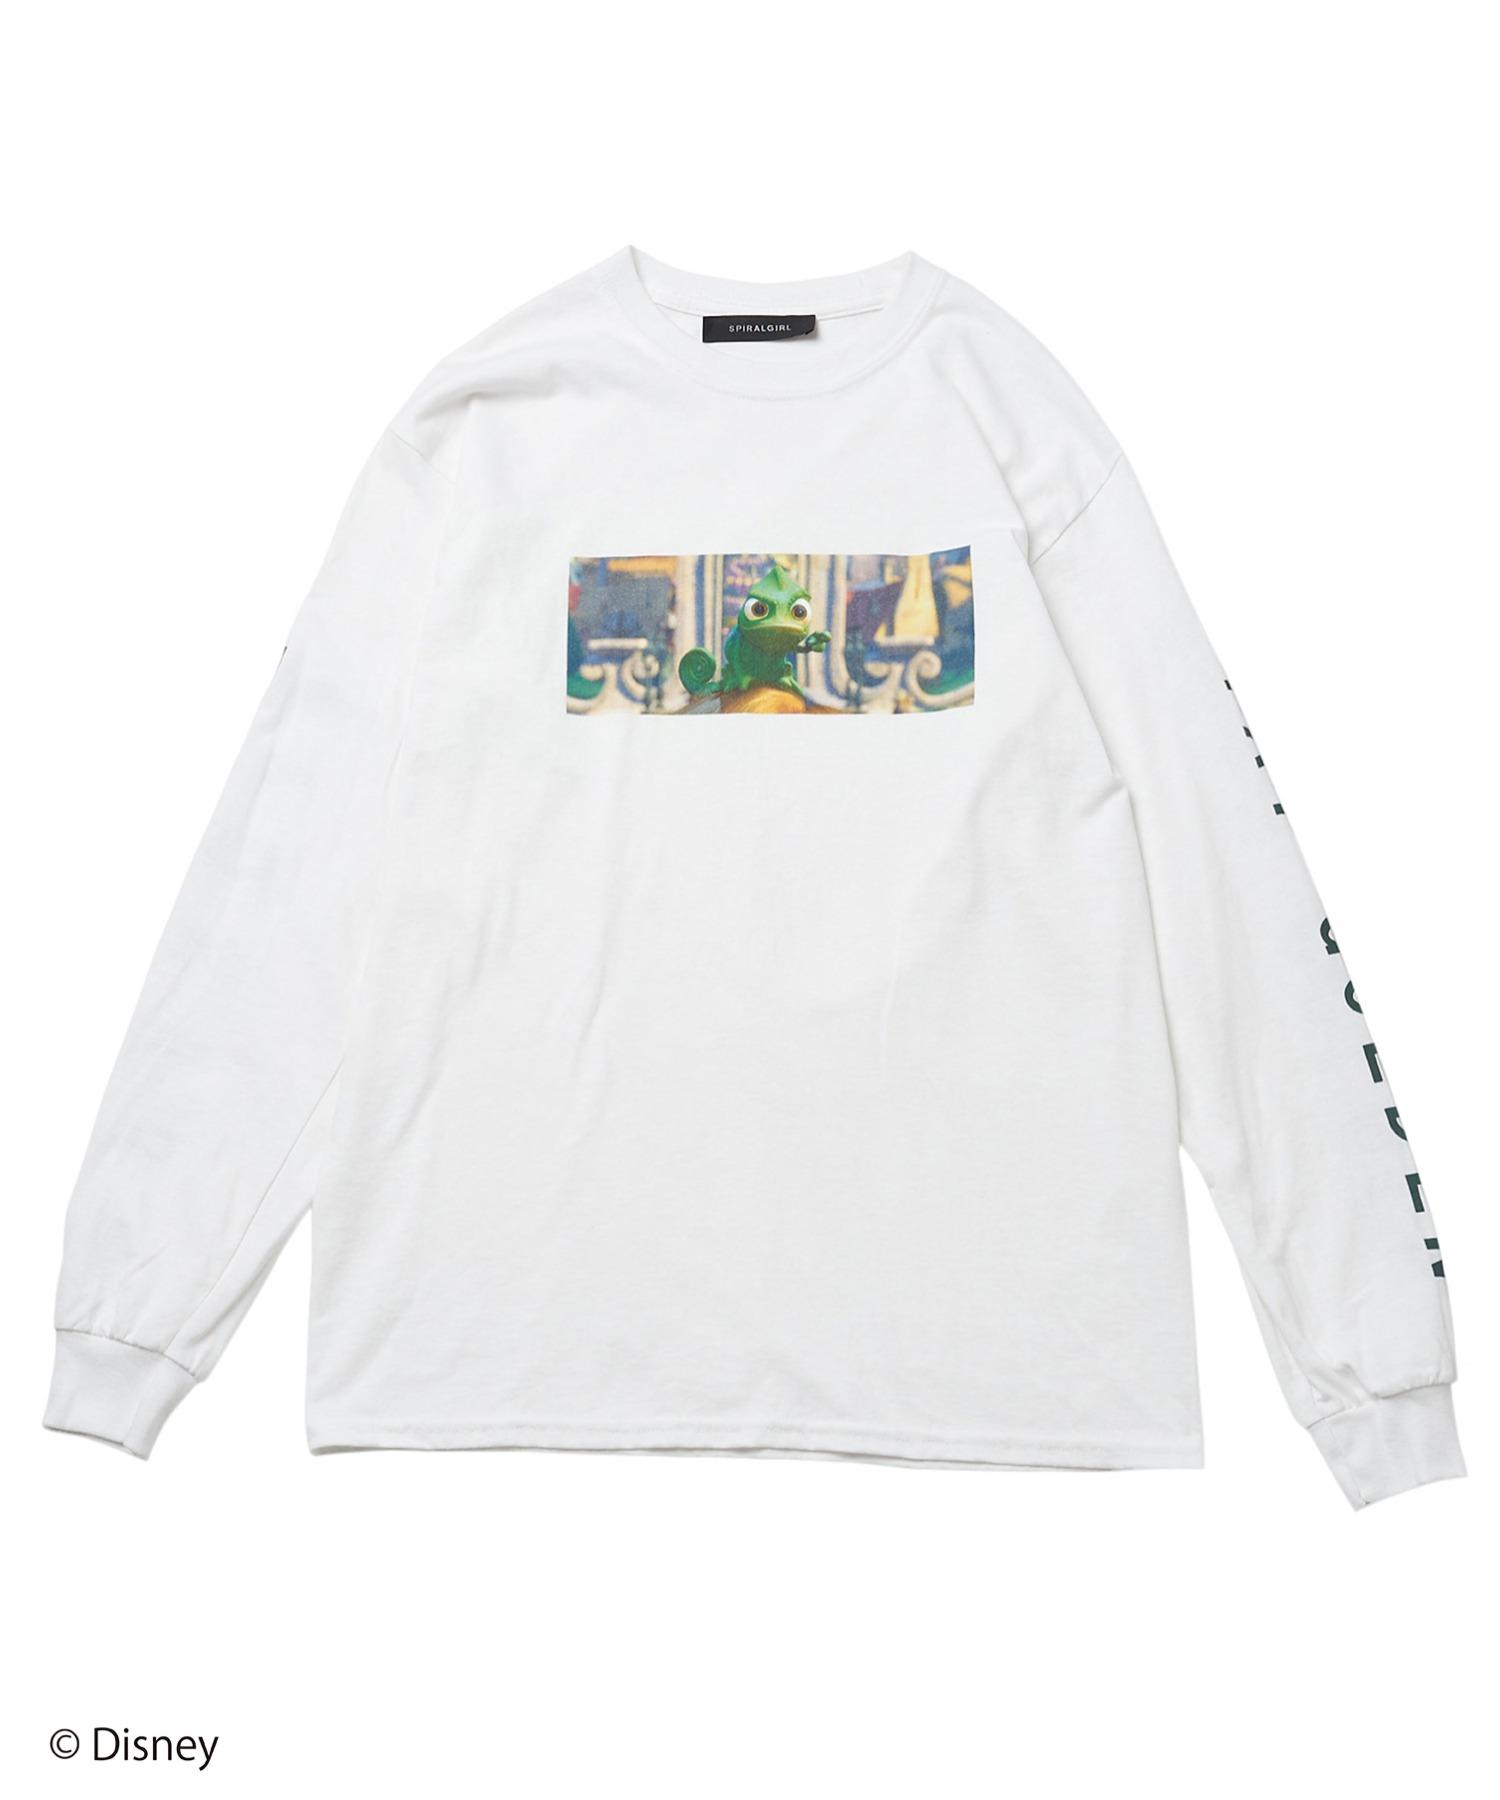 【Disney/ディズニー/塔の上のラプンツェル】ロングTシャツ